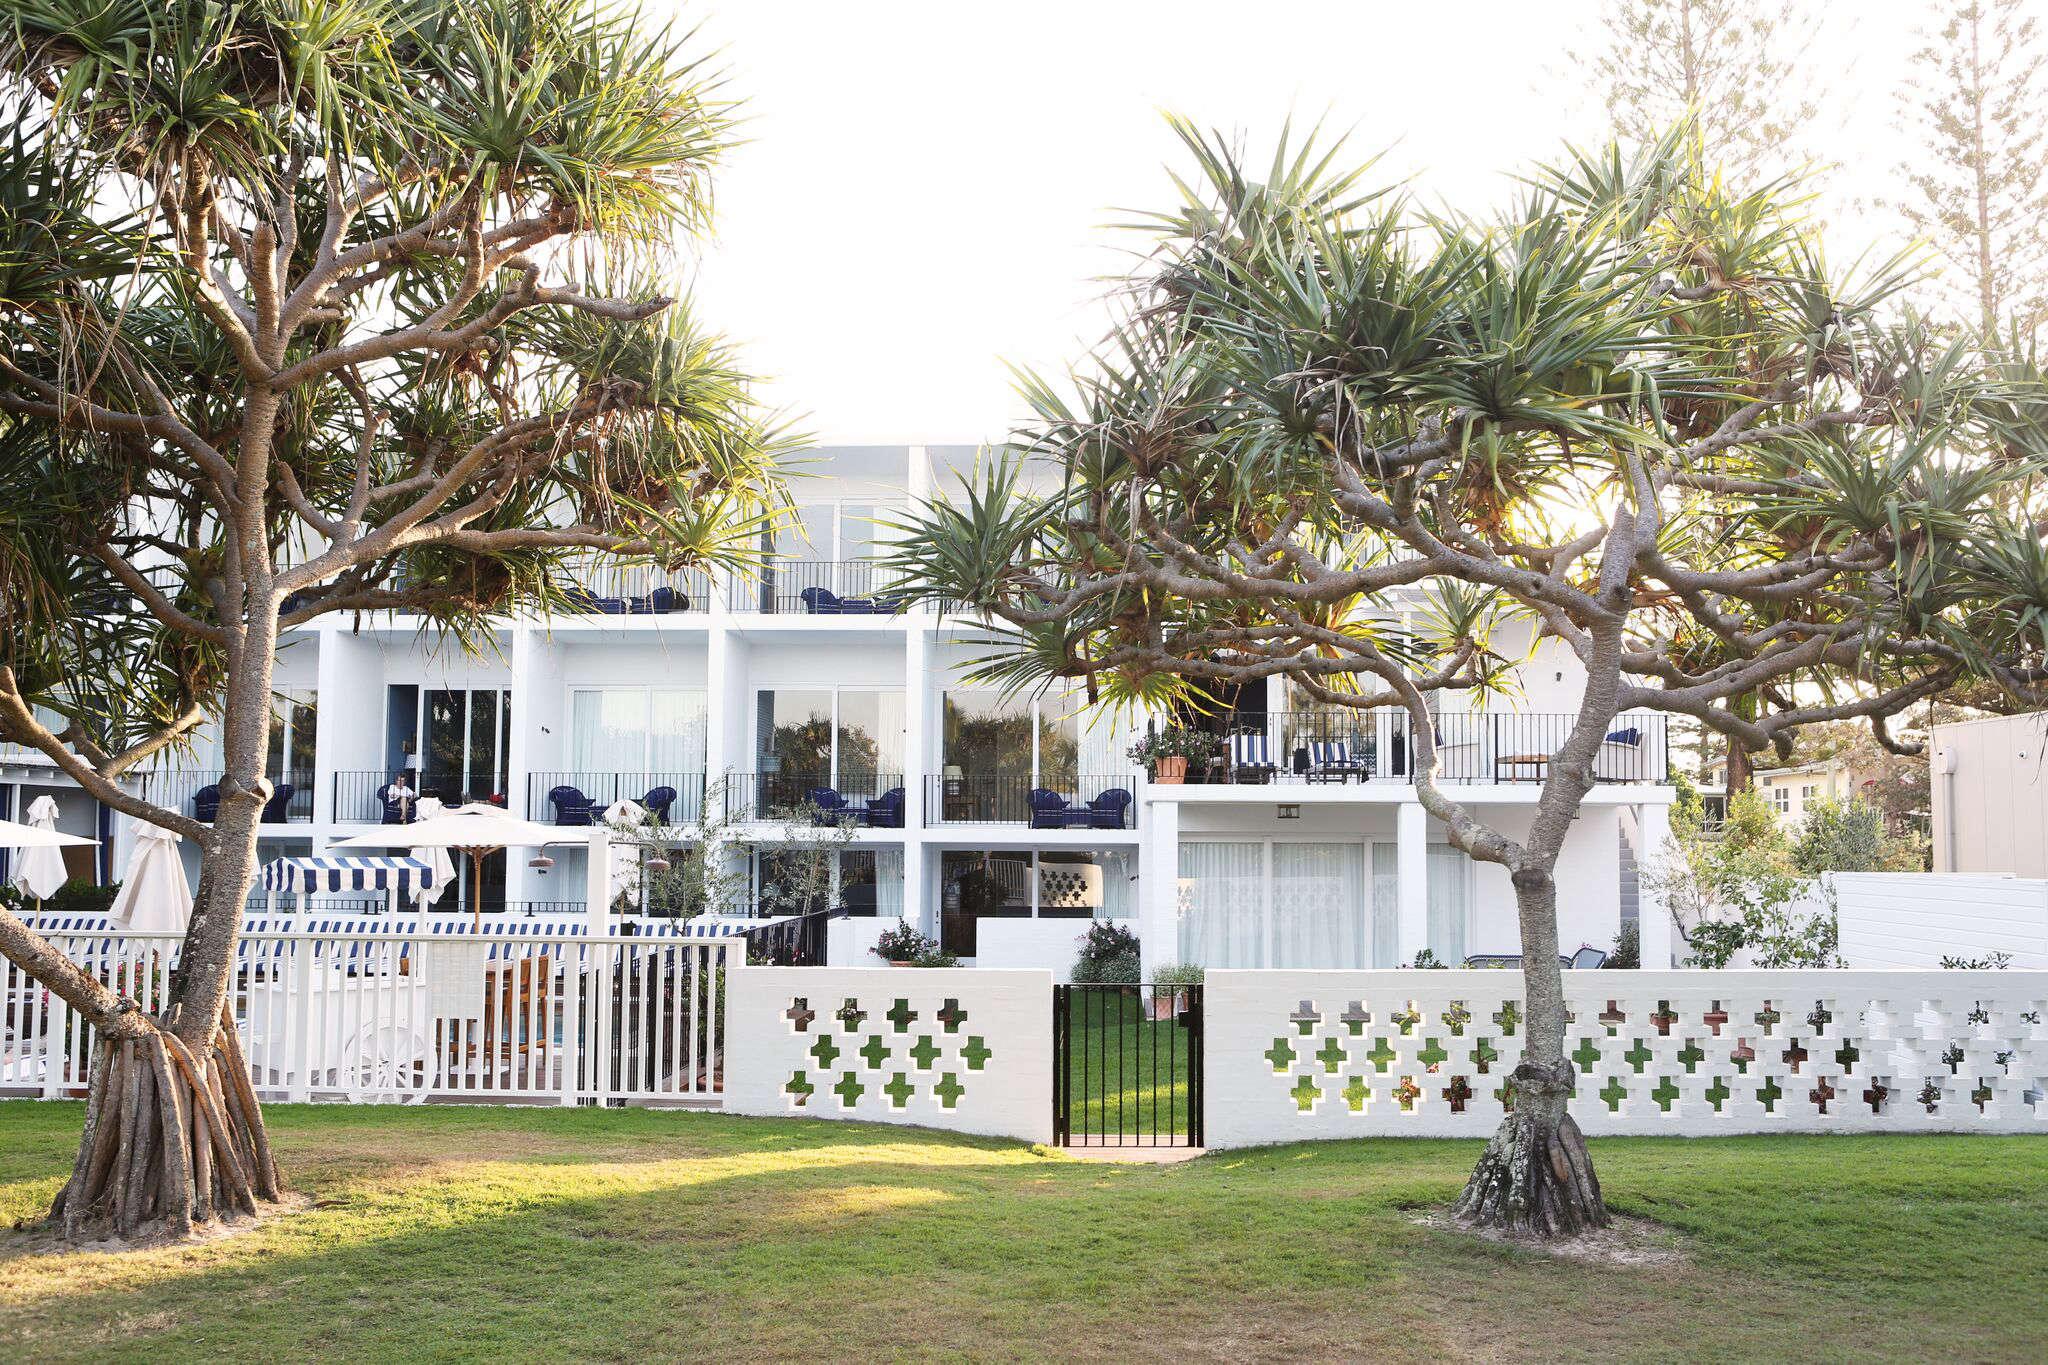 Halcyon House a reinvented beach motel in Cabarita Beach, Australia, Rhiannon Taylor photo | Remodelista